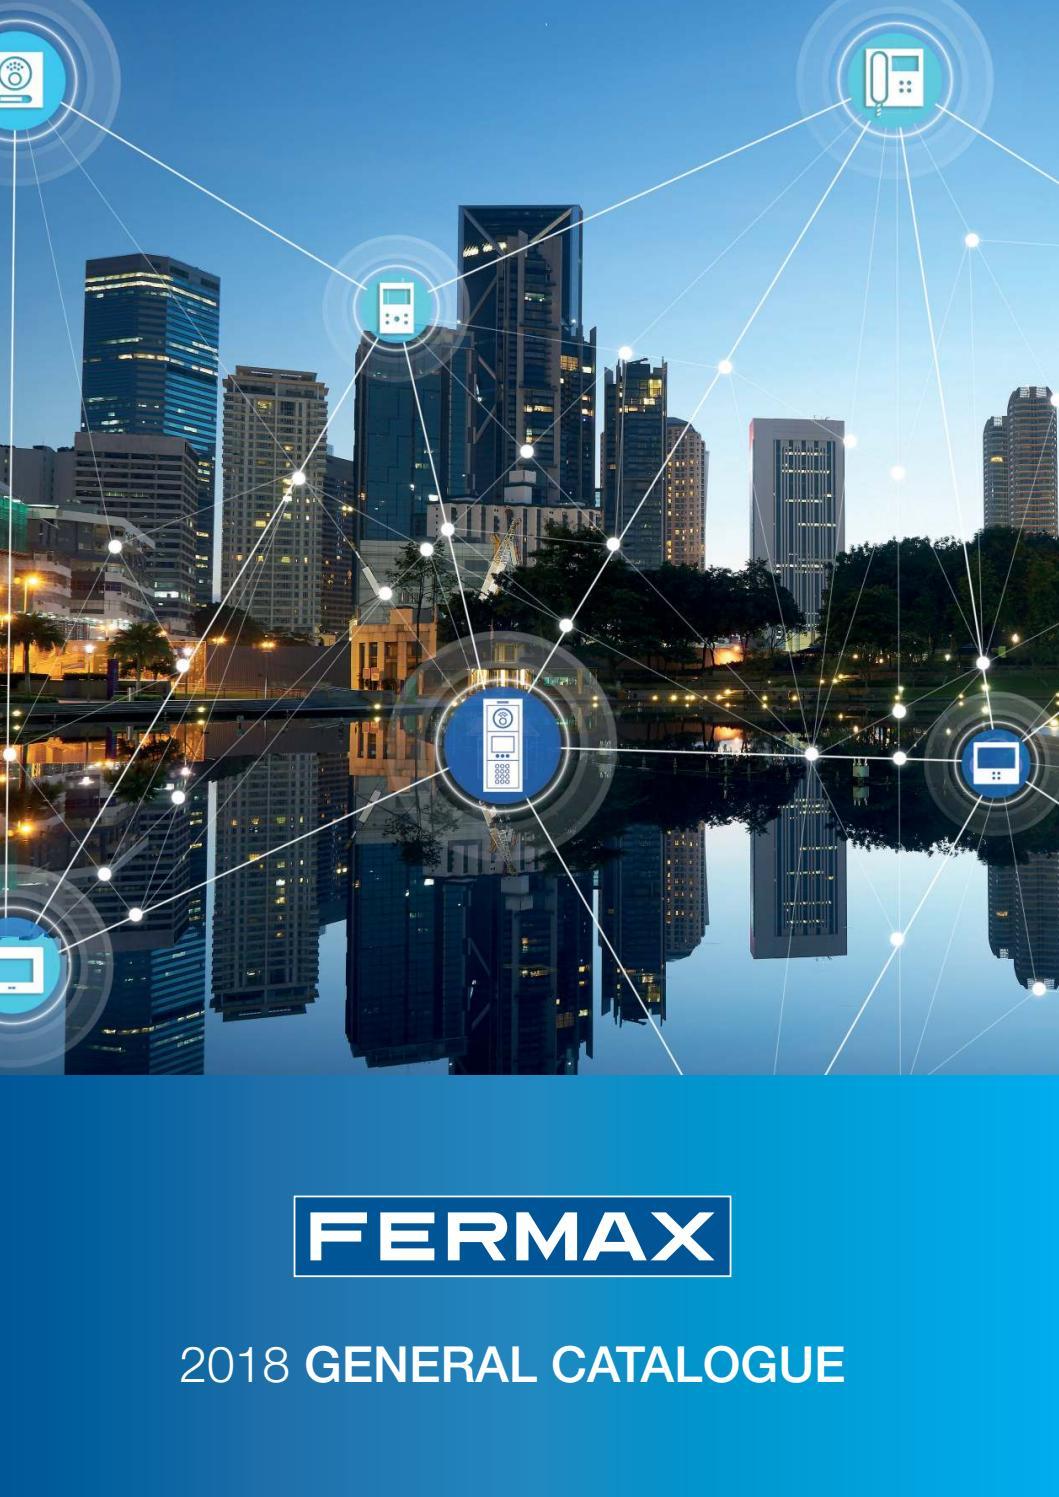 fermax 3305 wiring diagram